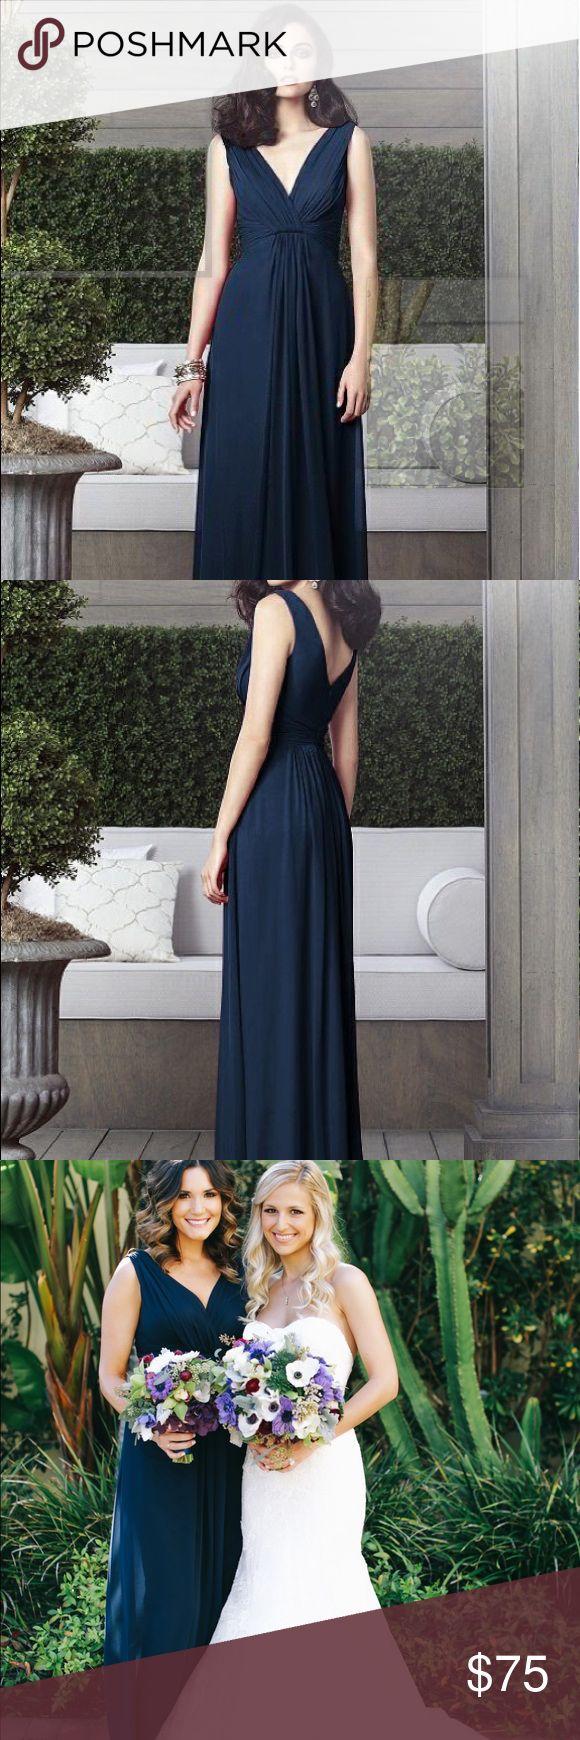 Mer enn 25 bra ideer om midnight blue bridesmaid dresses p dessy bridesmaid dress style 2907 ombrellifo Images